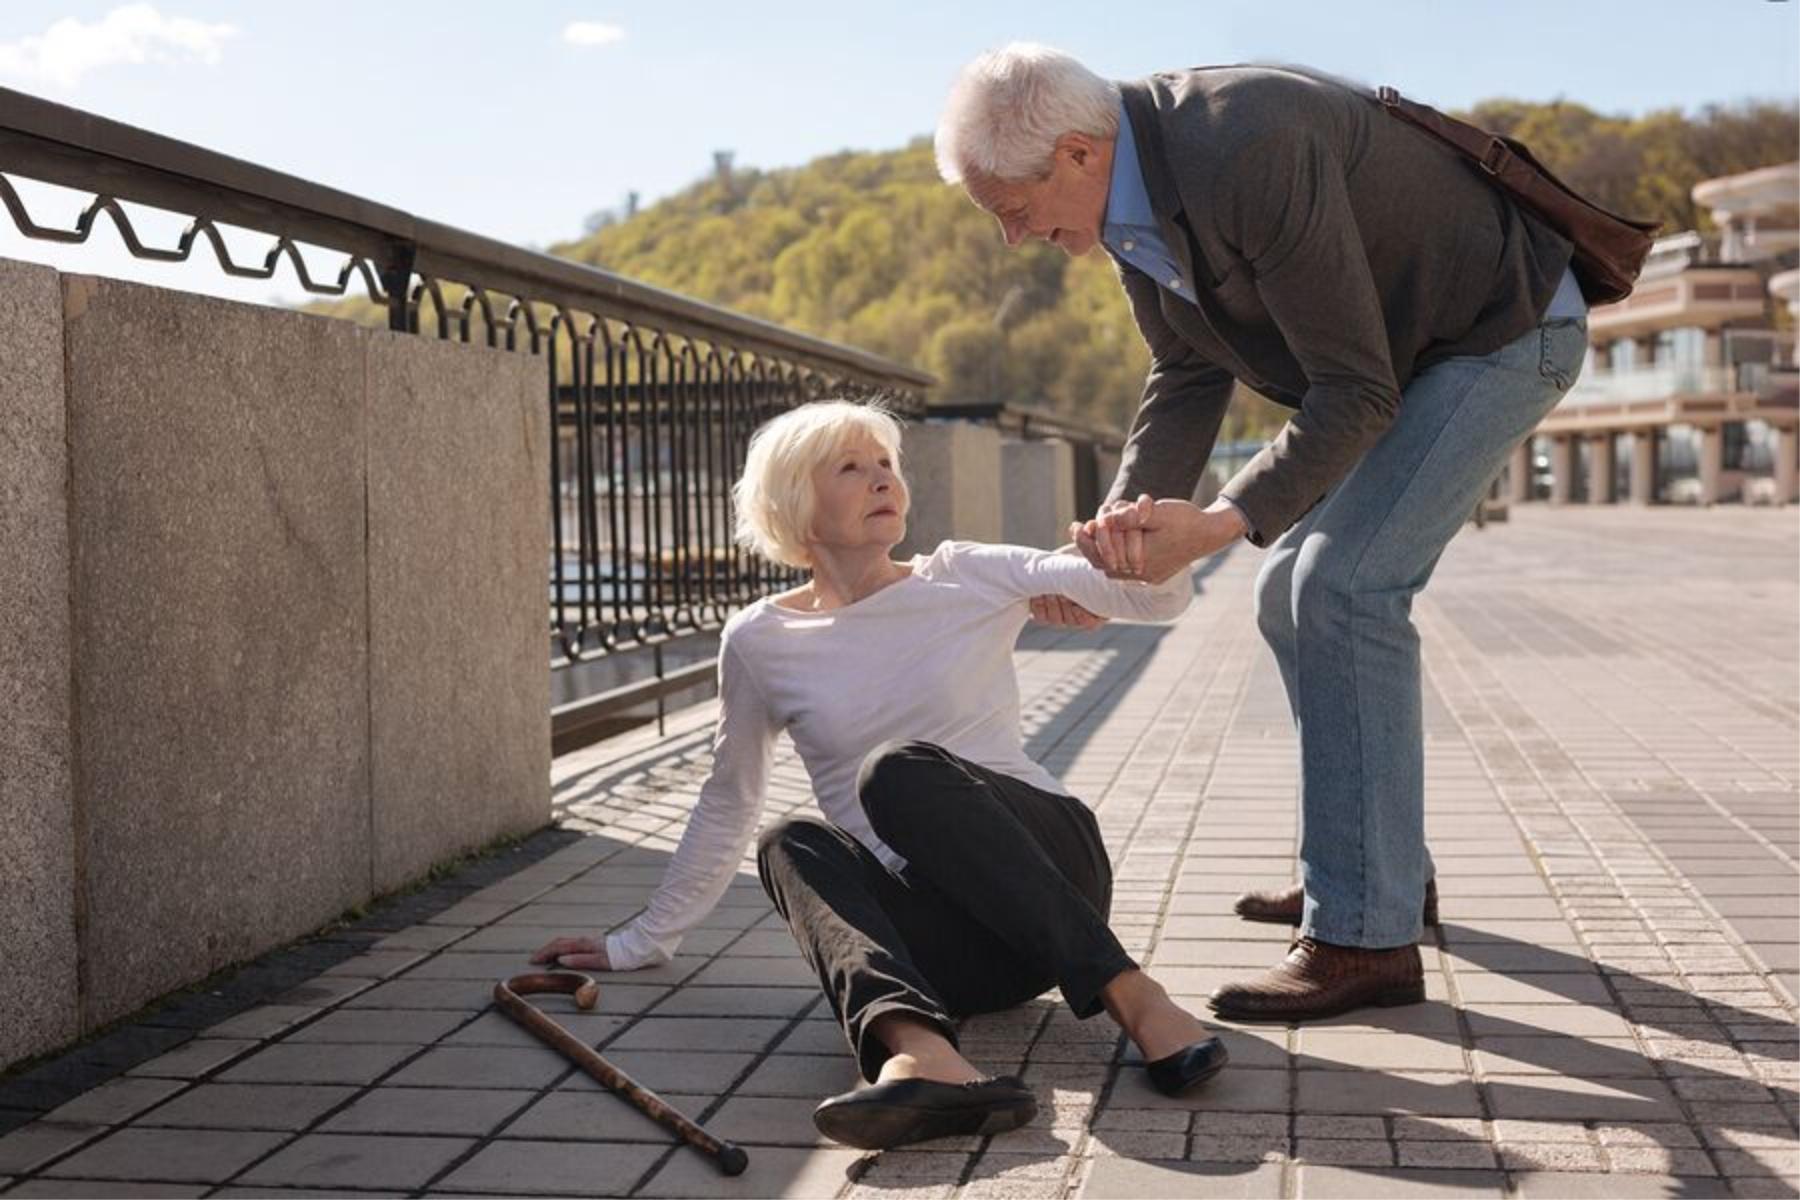 Crystal Home Health Care's Fall Prevention Program